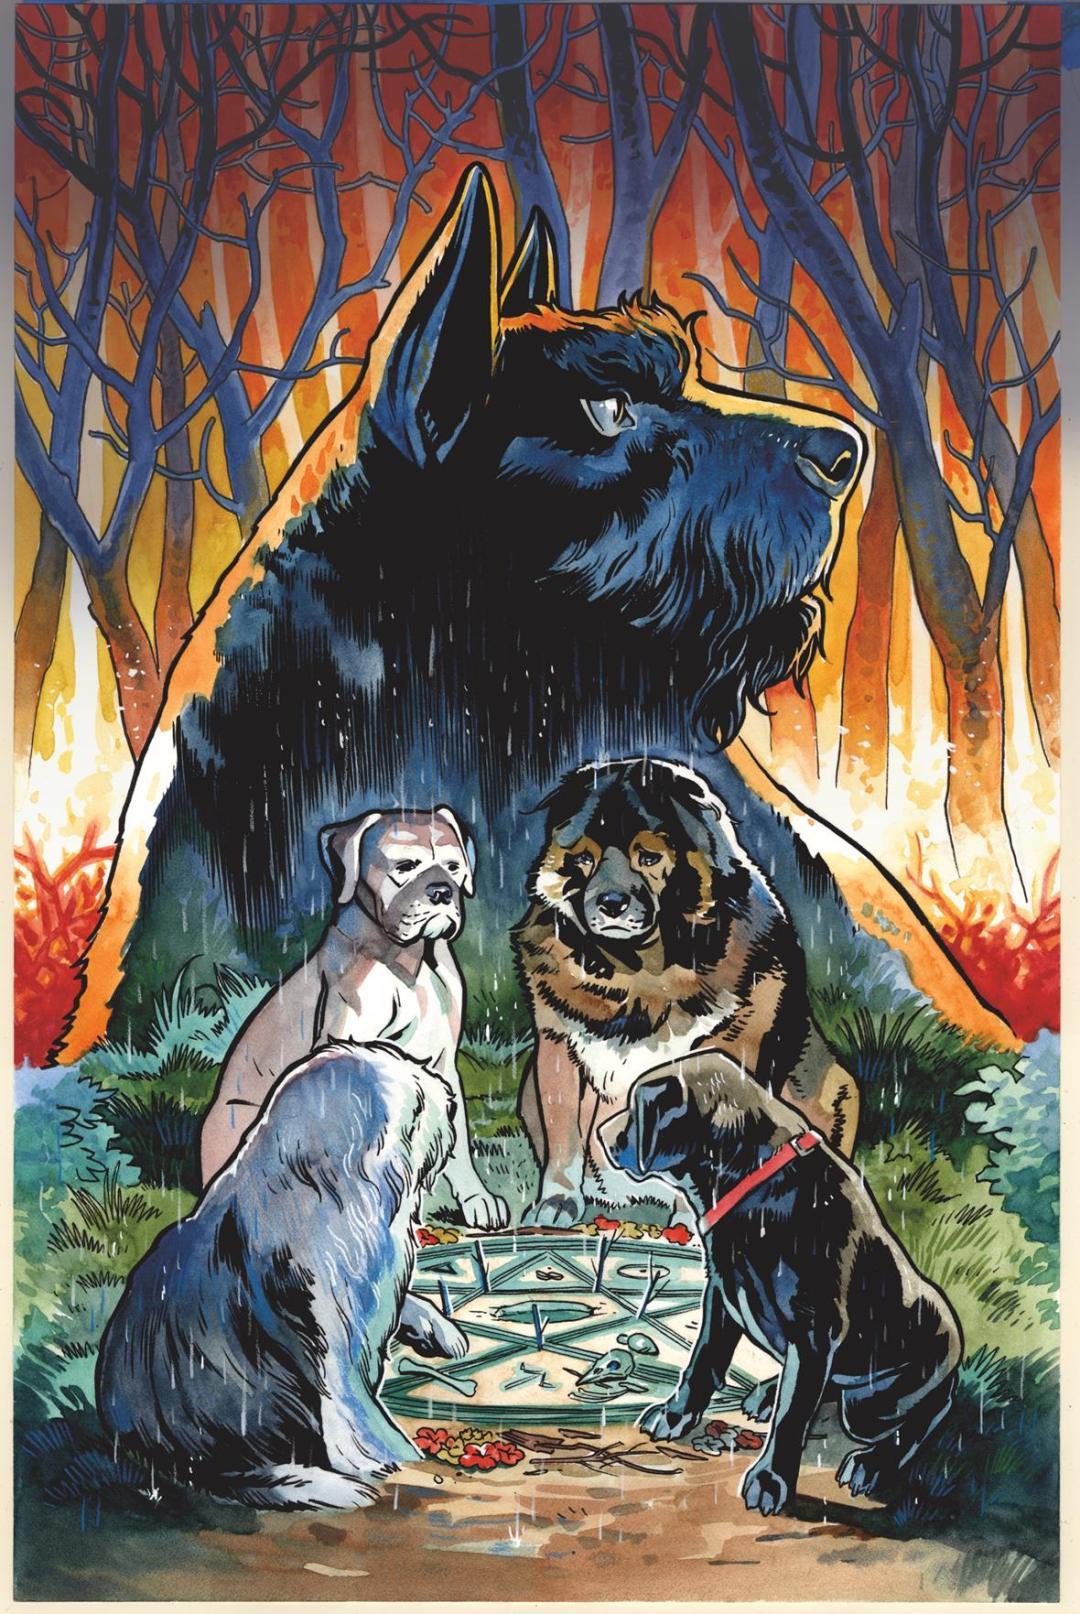 Eight-Time Eisner Award-Winning Series 'Beasts of Burden' Returns to Dark Horse